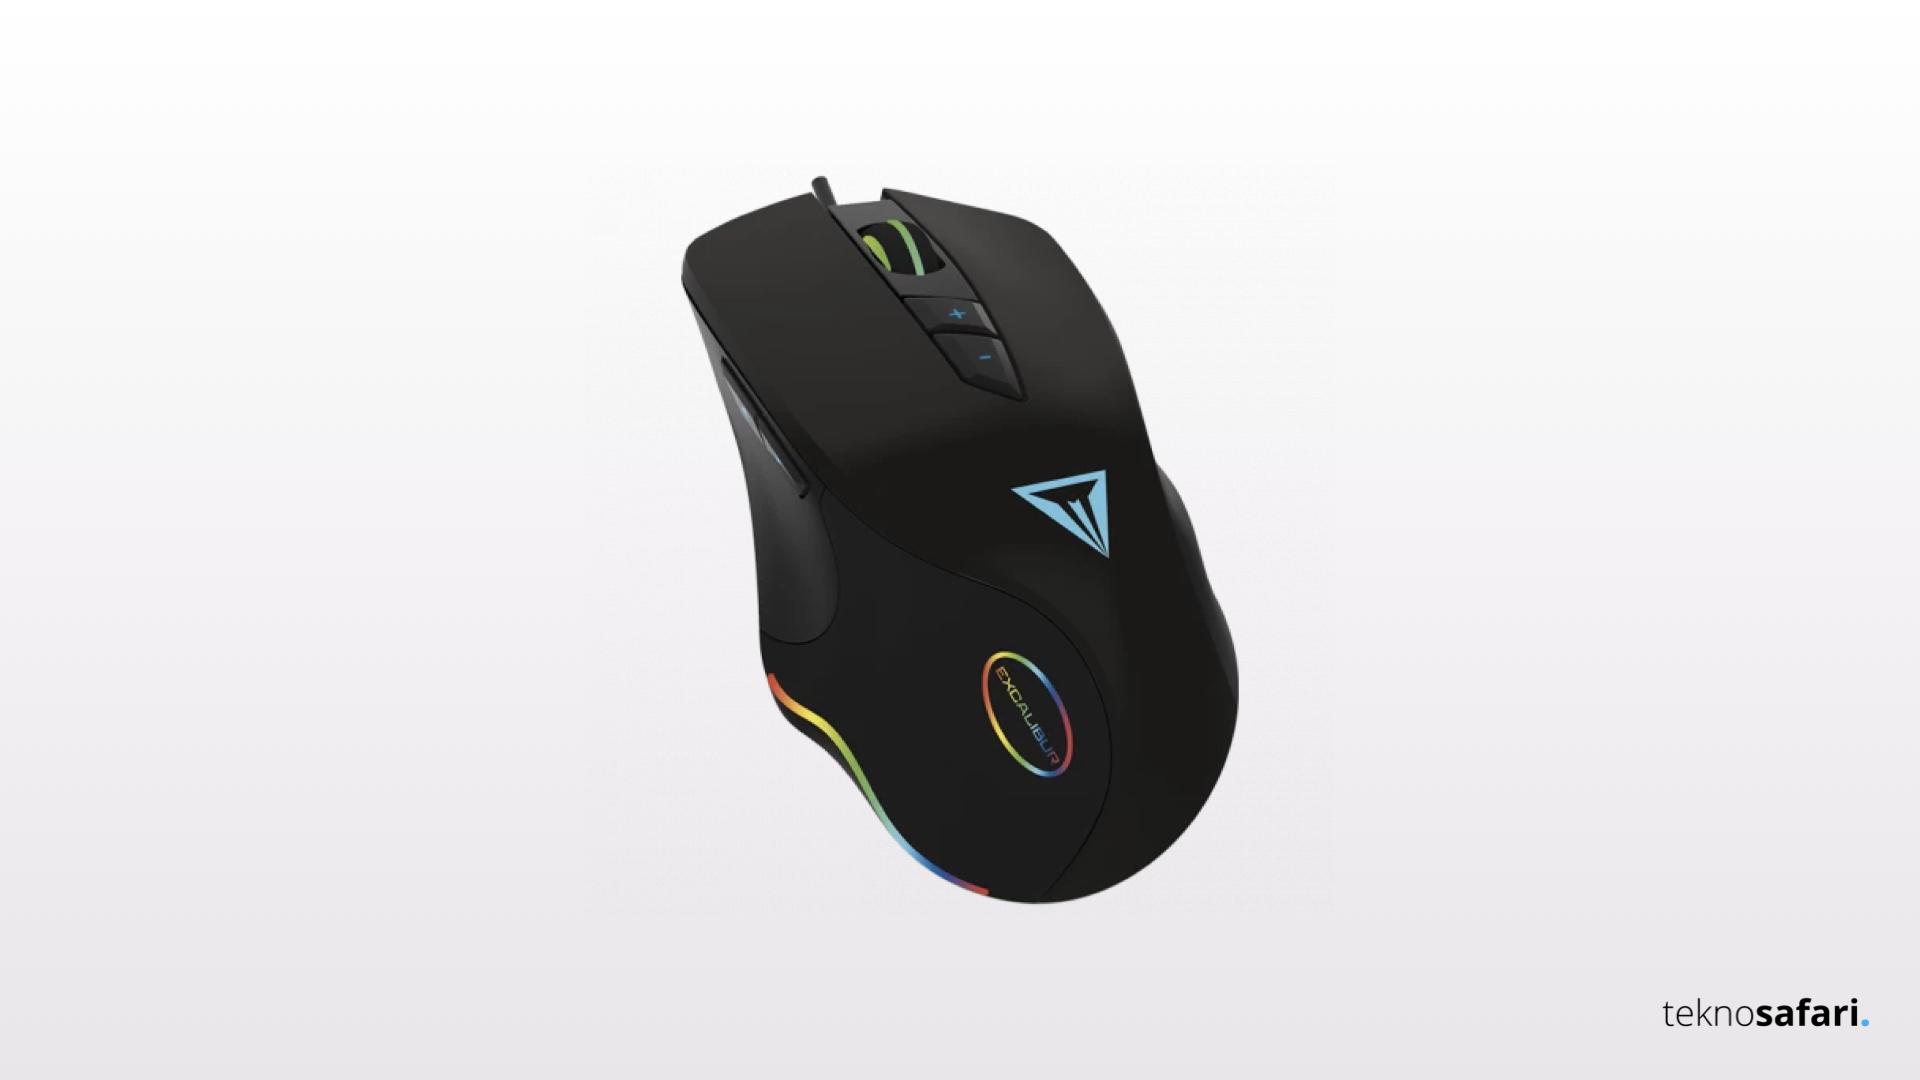 Excalibur oyuncu mouse: GX21